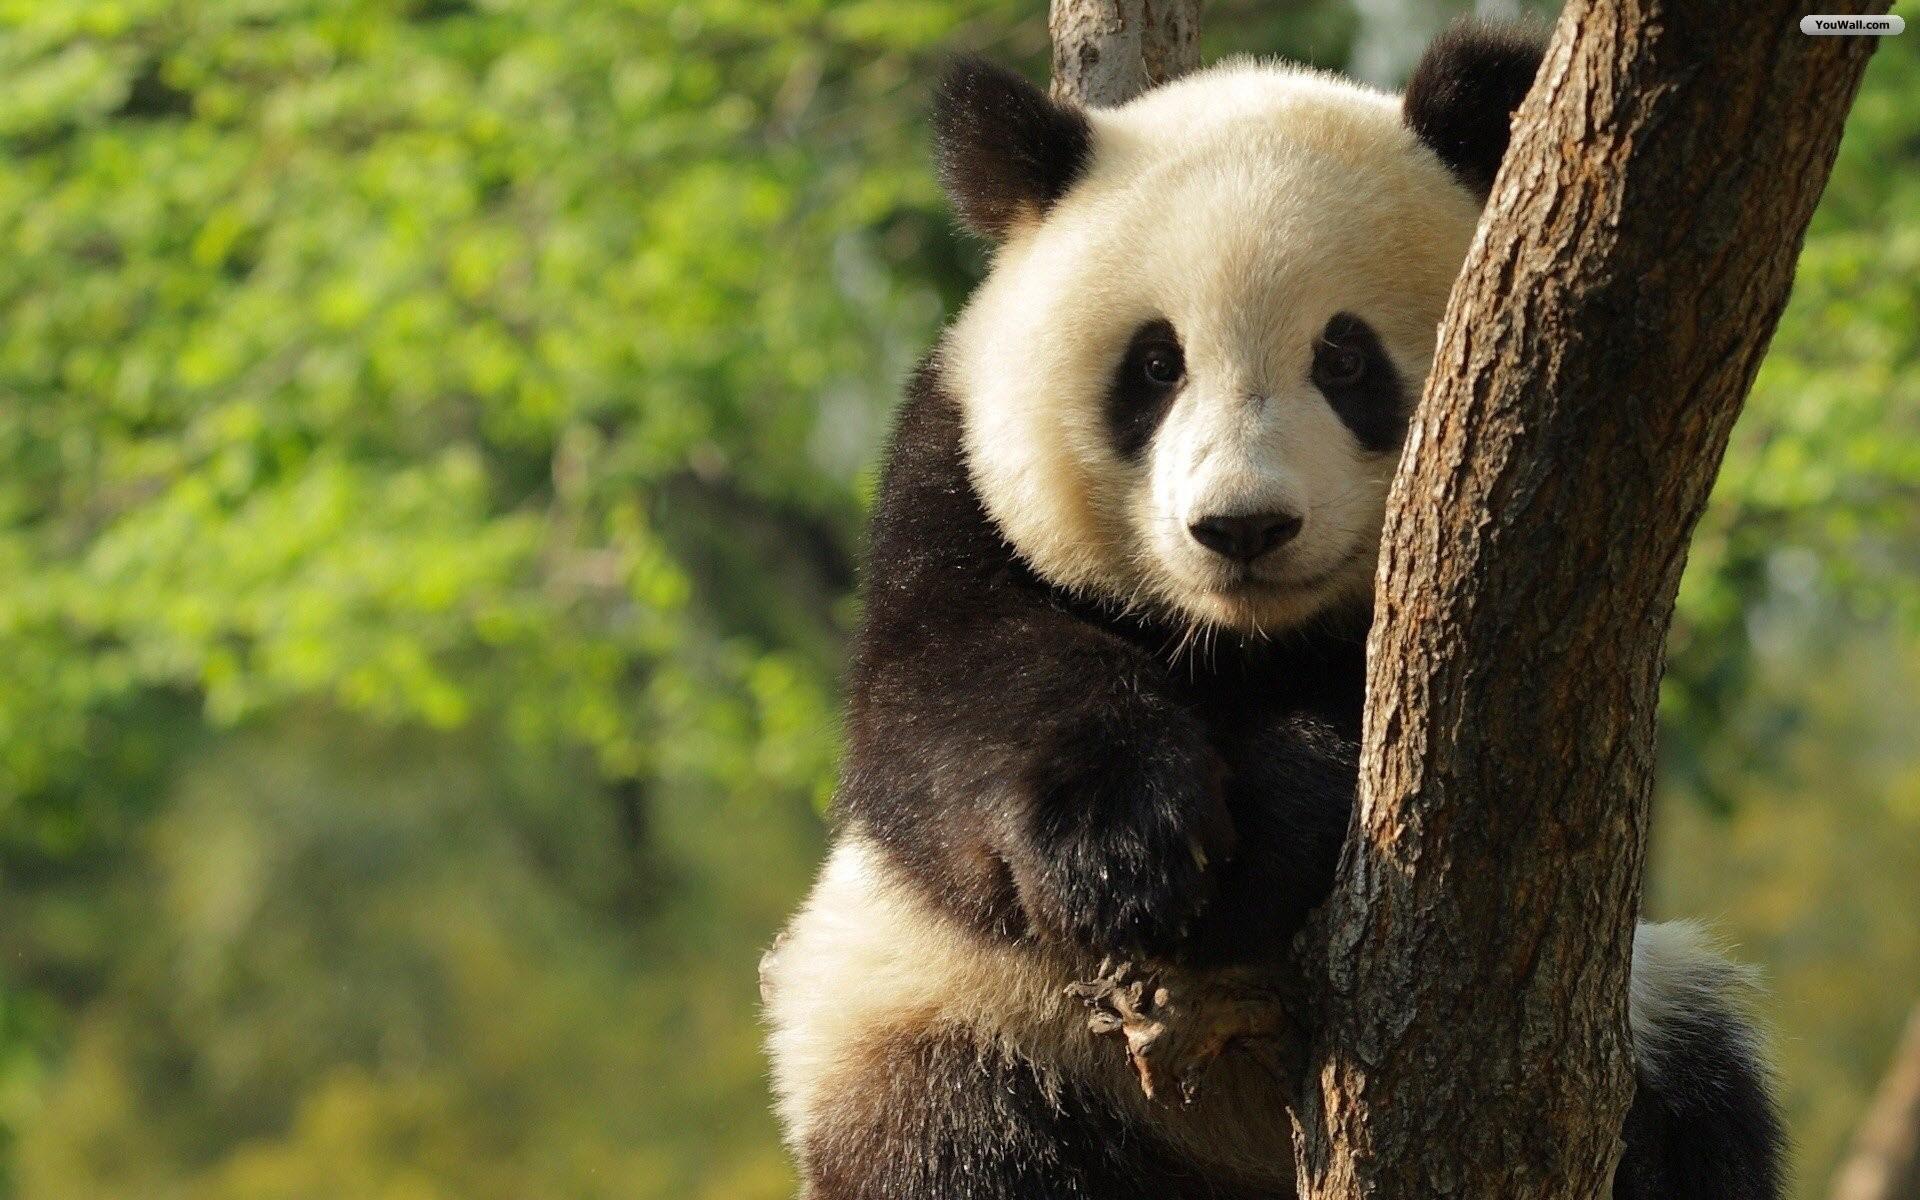 hinh gau truc panda 10